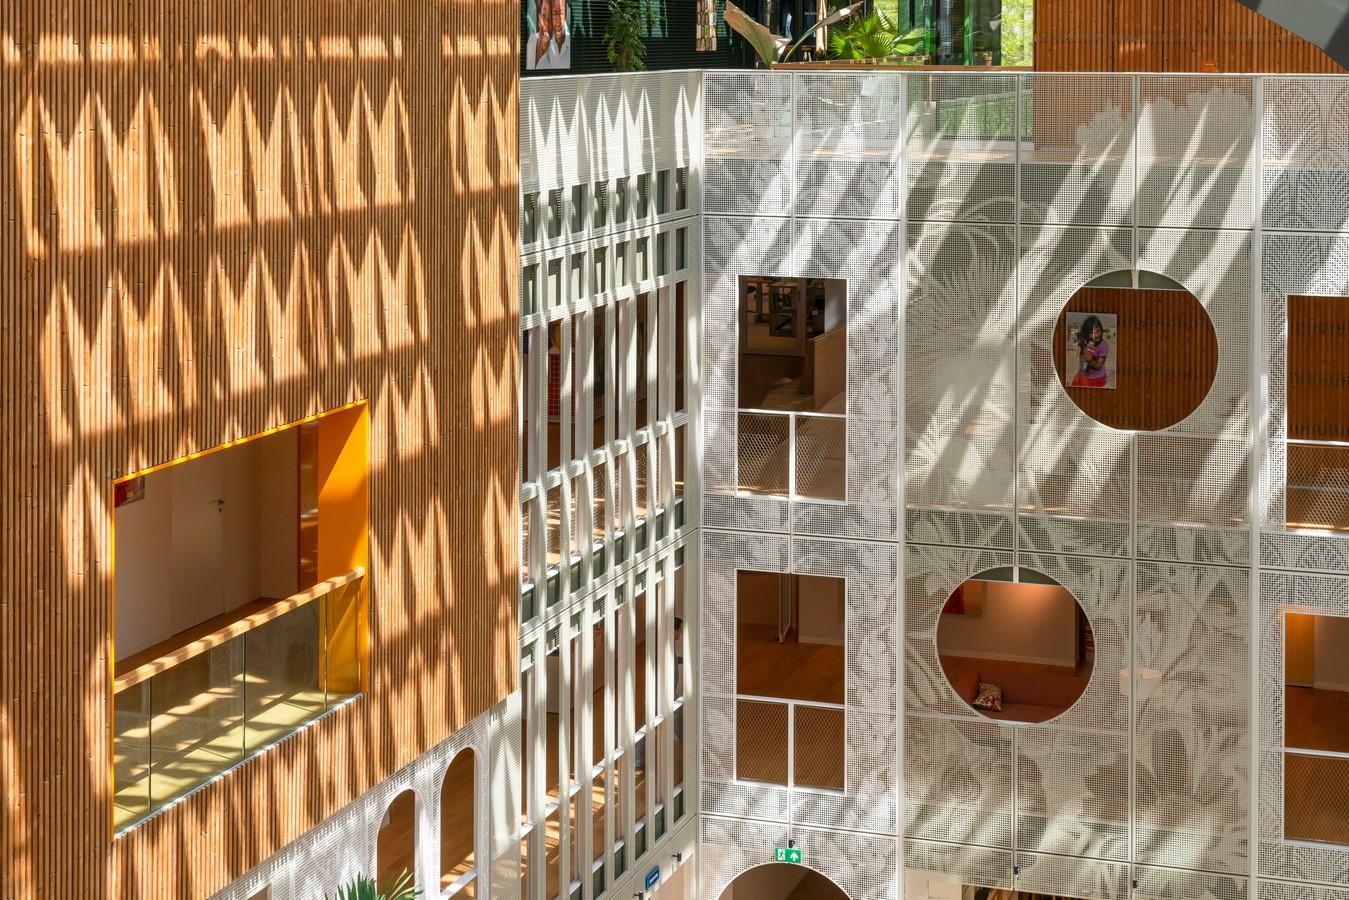 Goede Doelen Loterijen & Dutch Charity Lotteries Head Offices by Benthem Crouwel Architects: Under one roof - Sheet5